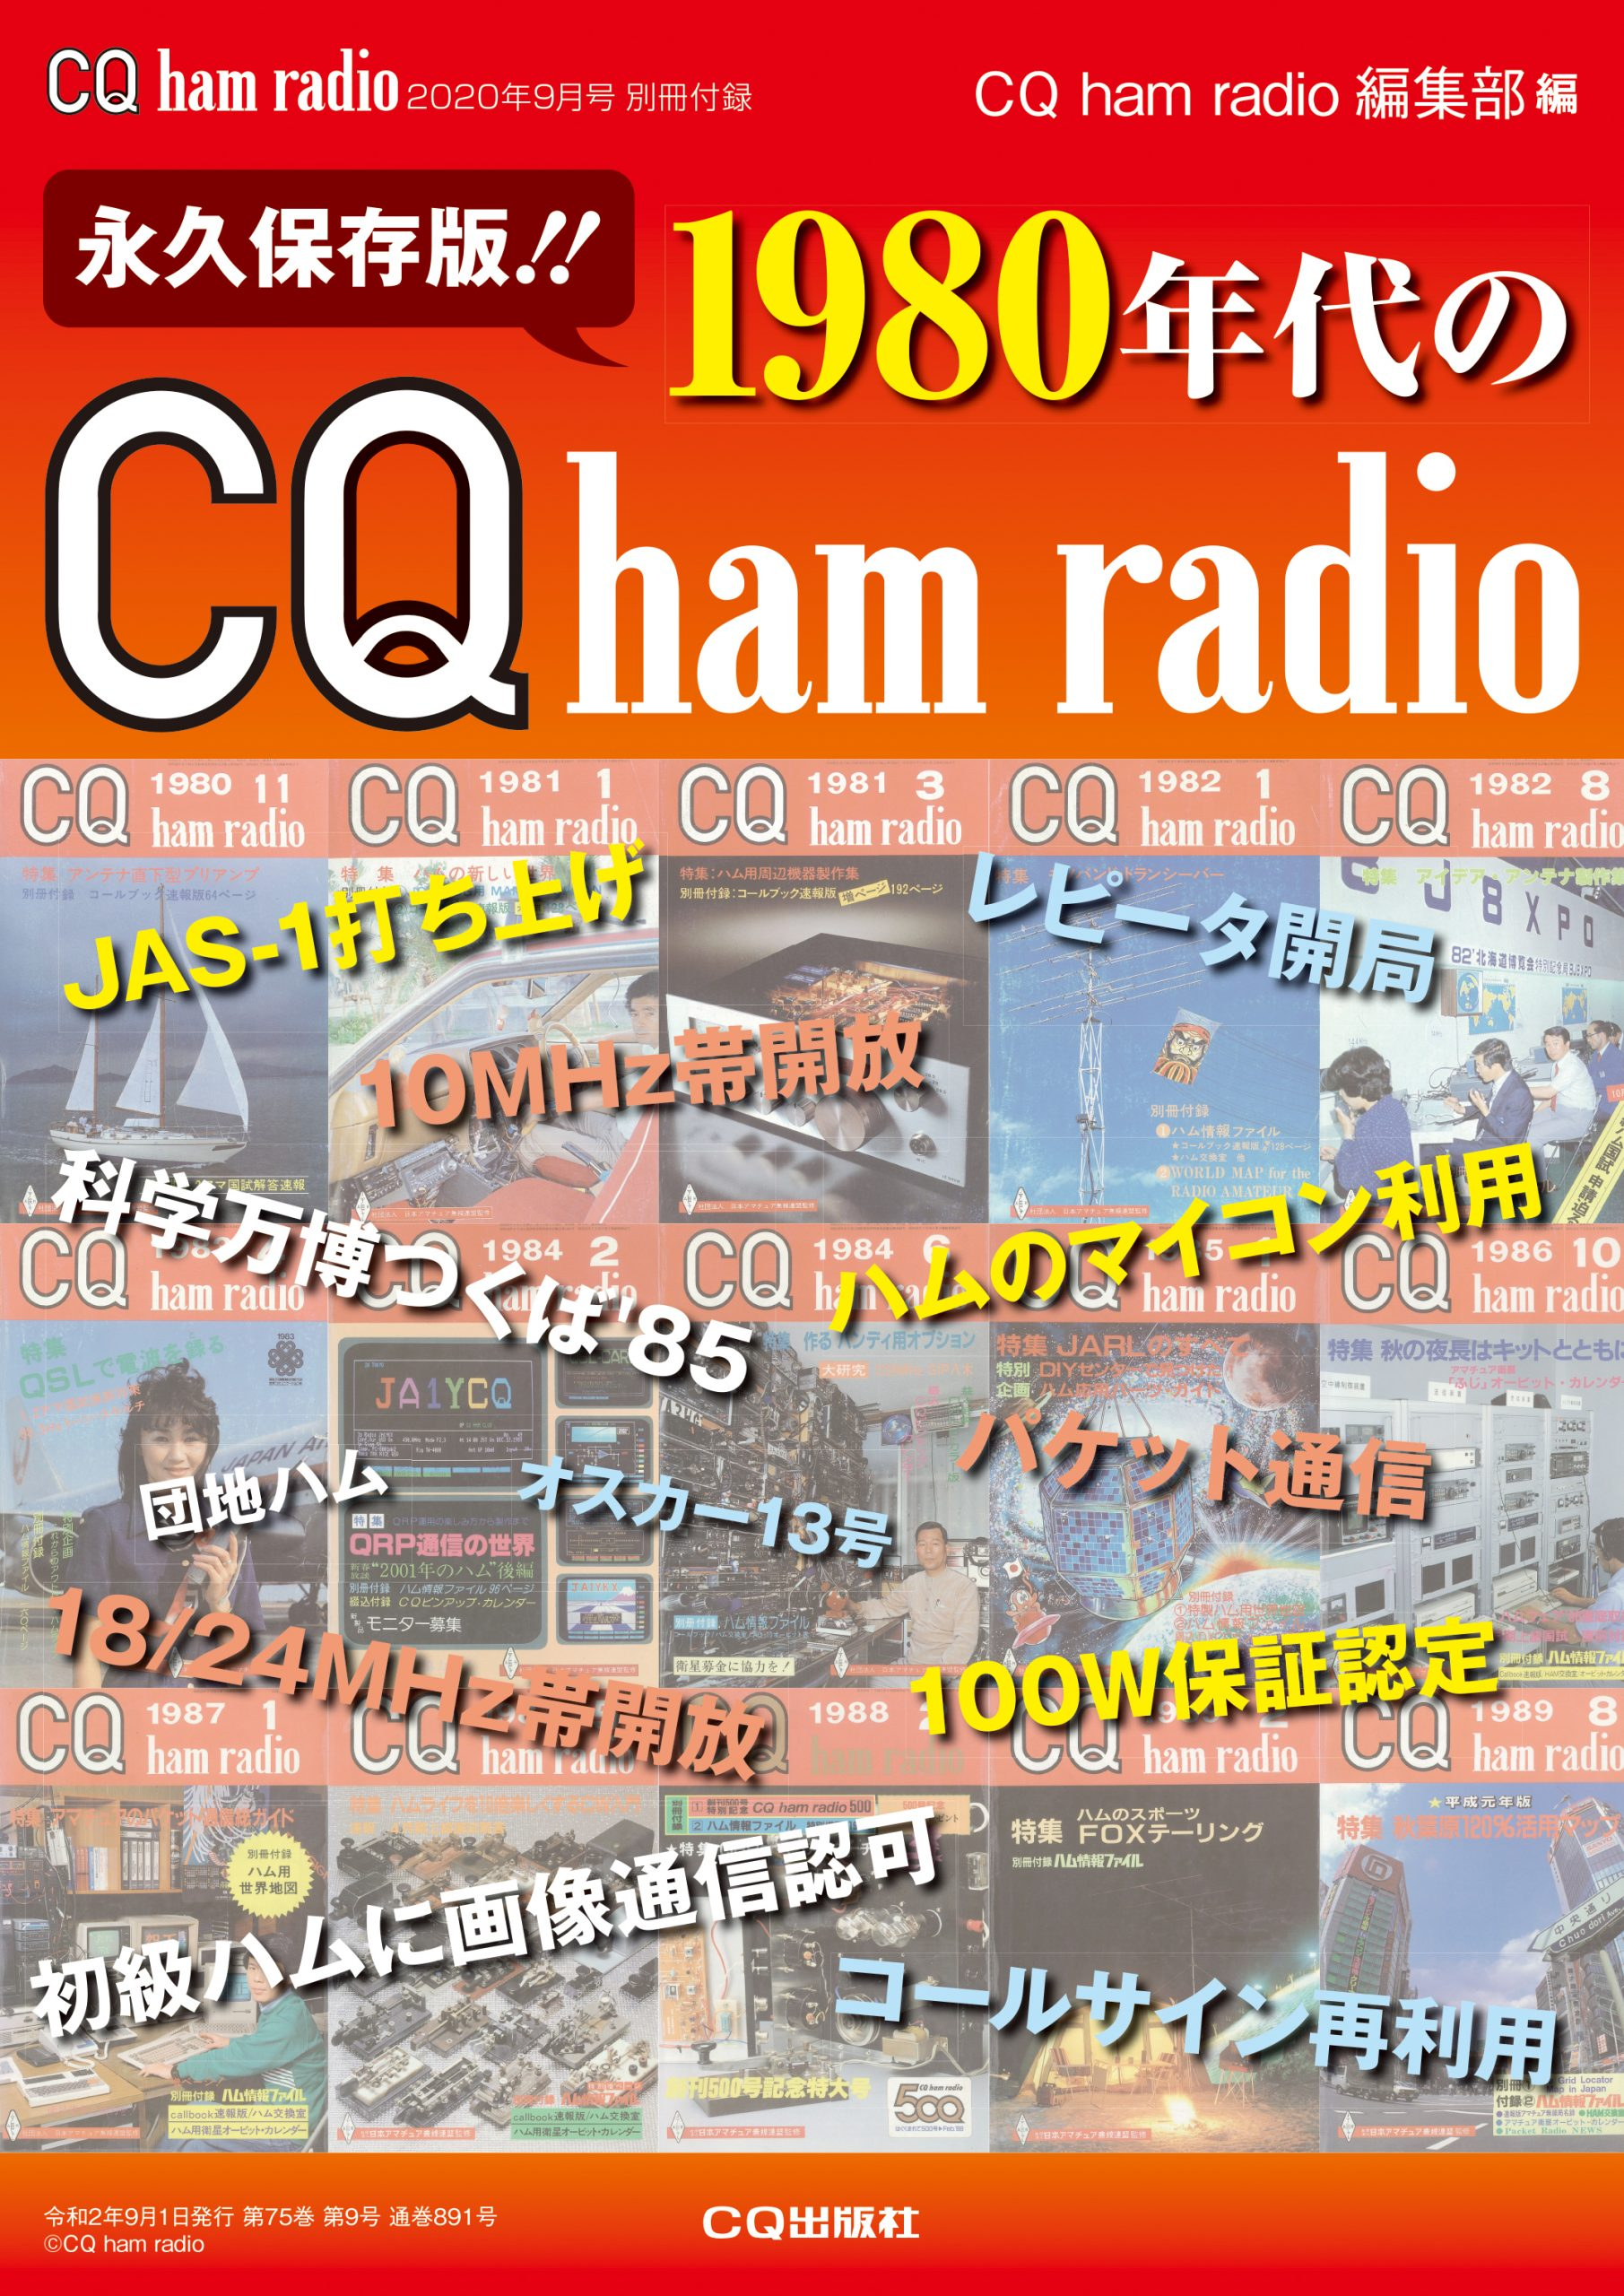 CQ ham radio 2020年9月号 1980年代のCQ ham radio